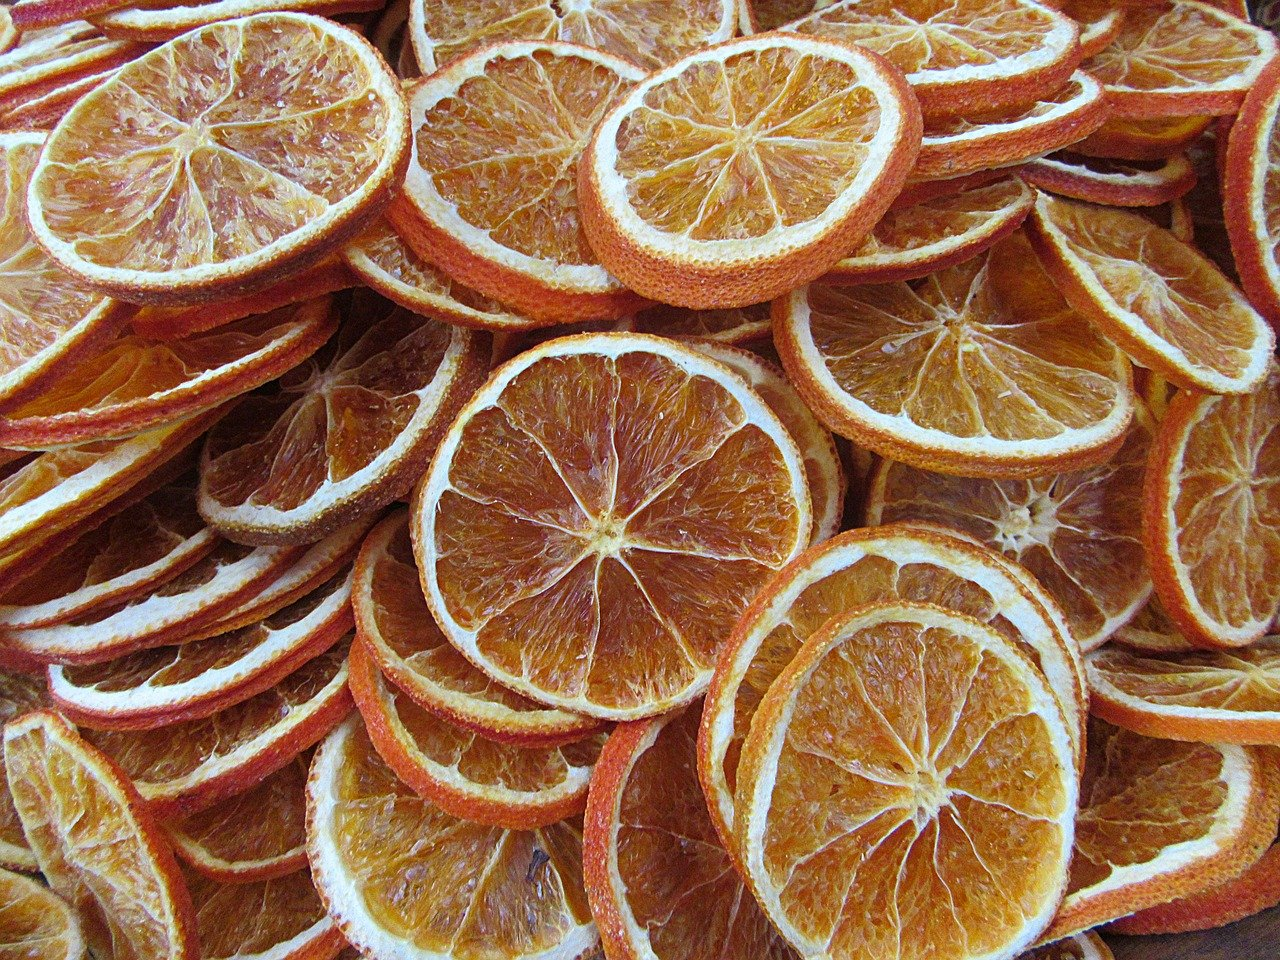 arance-essiccate-come-farle